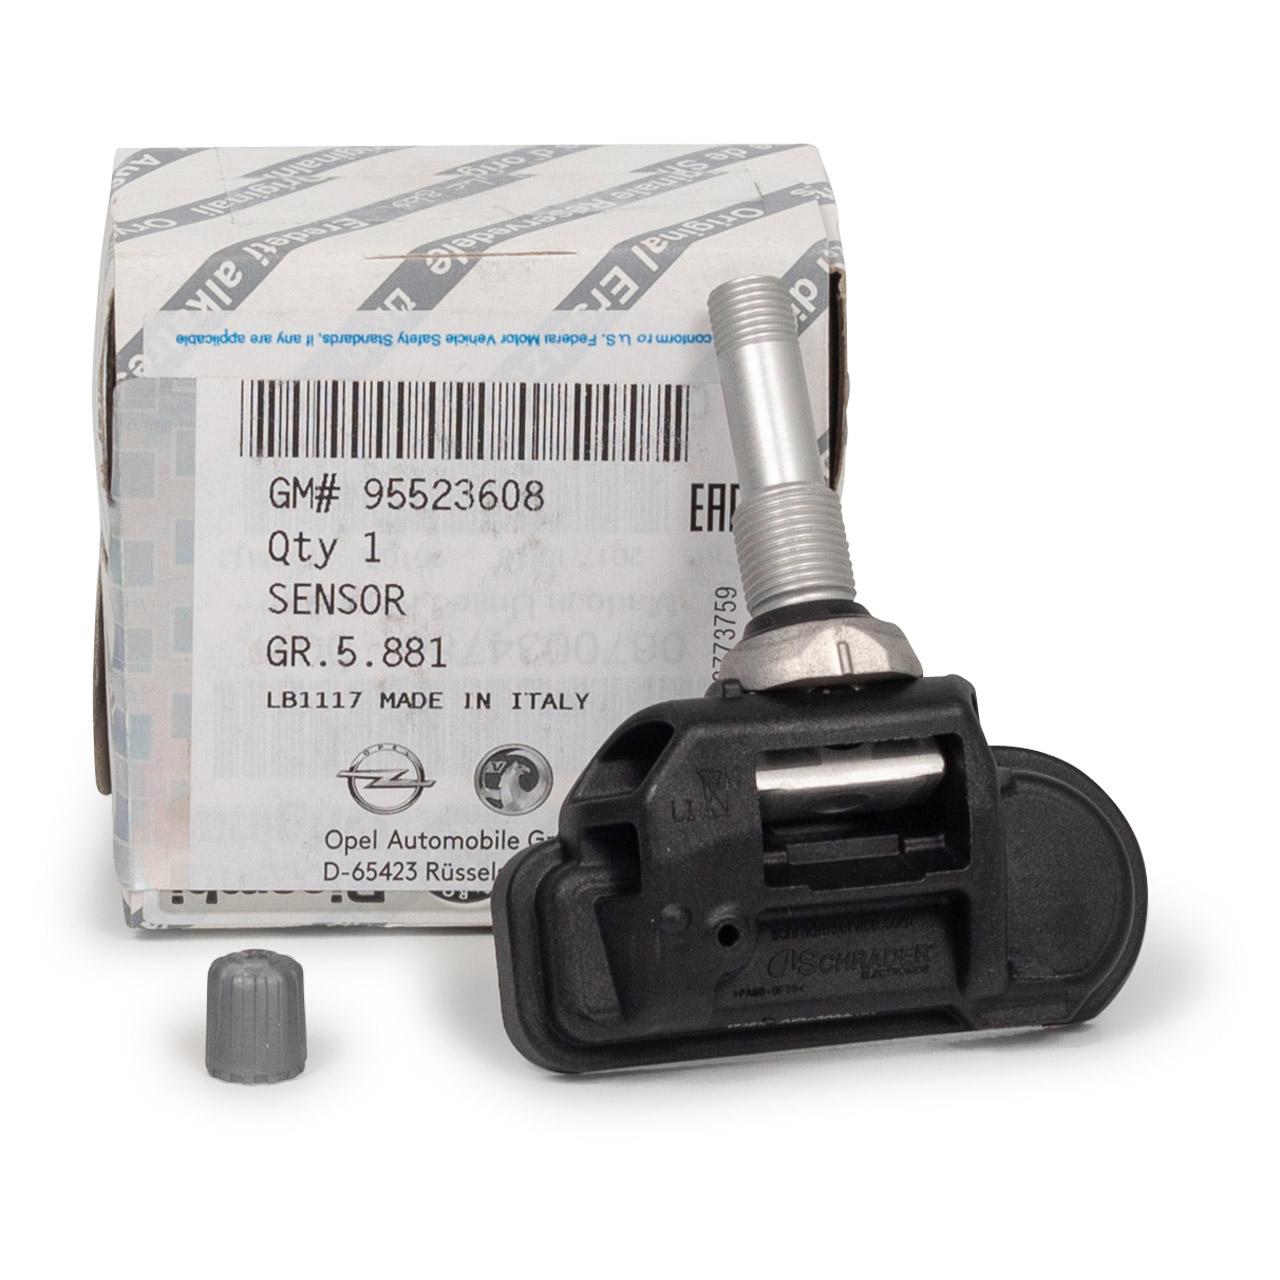 ORIGINAL Opel RDKS Reifendrucksensor Luftdrucksensor 16 Zoll COMBO X12 95523608